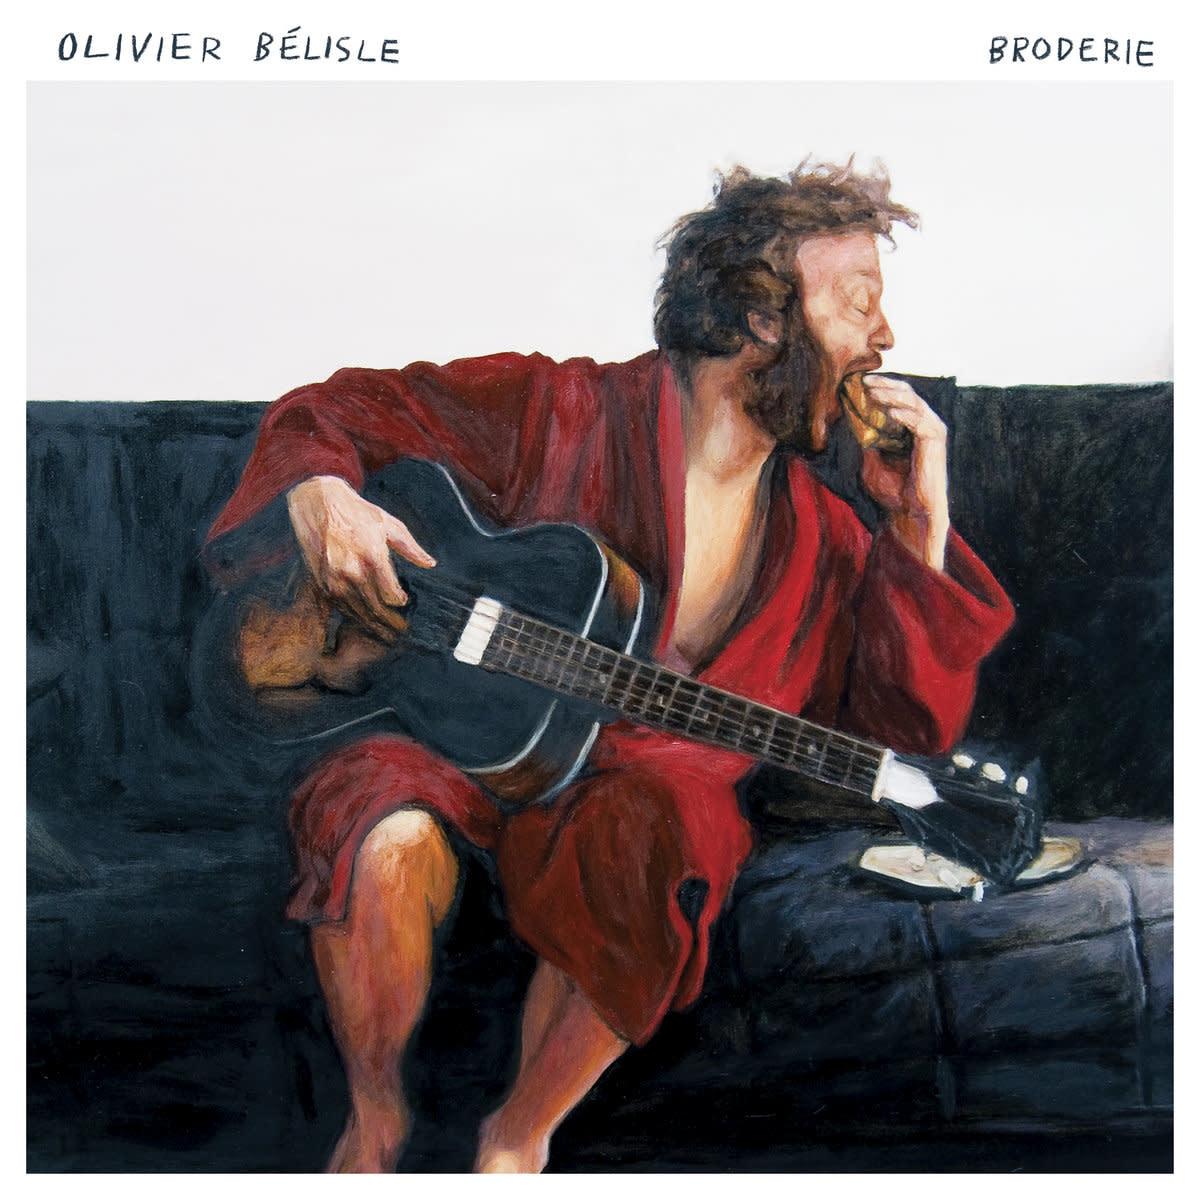 Olivier Bélisle • Broderie-1